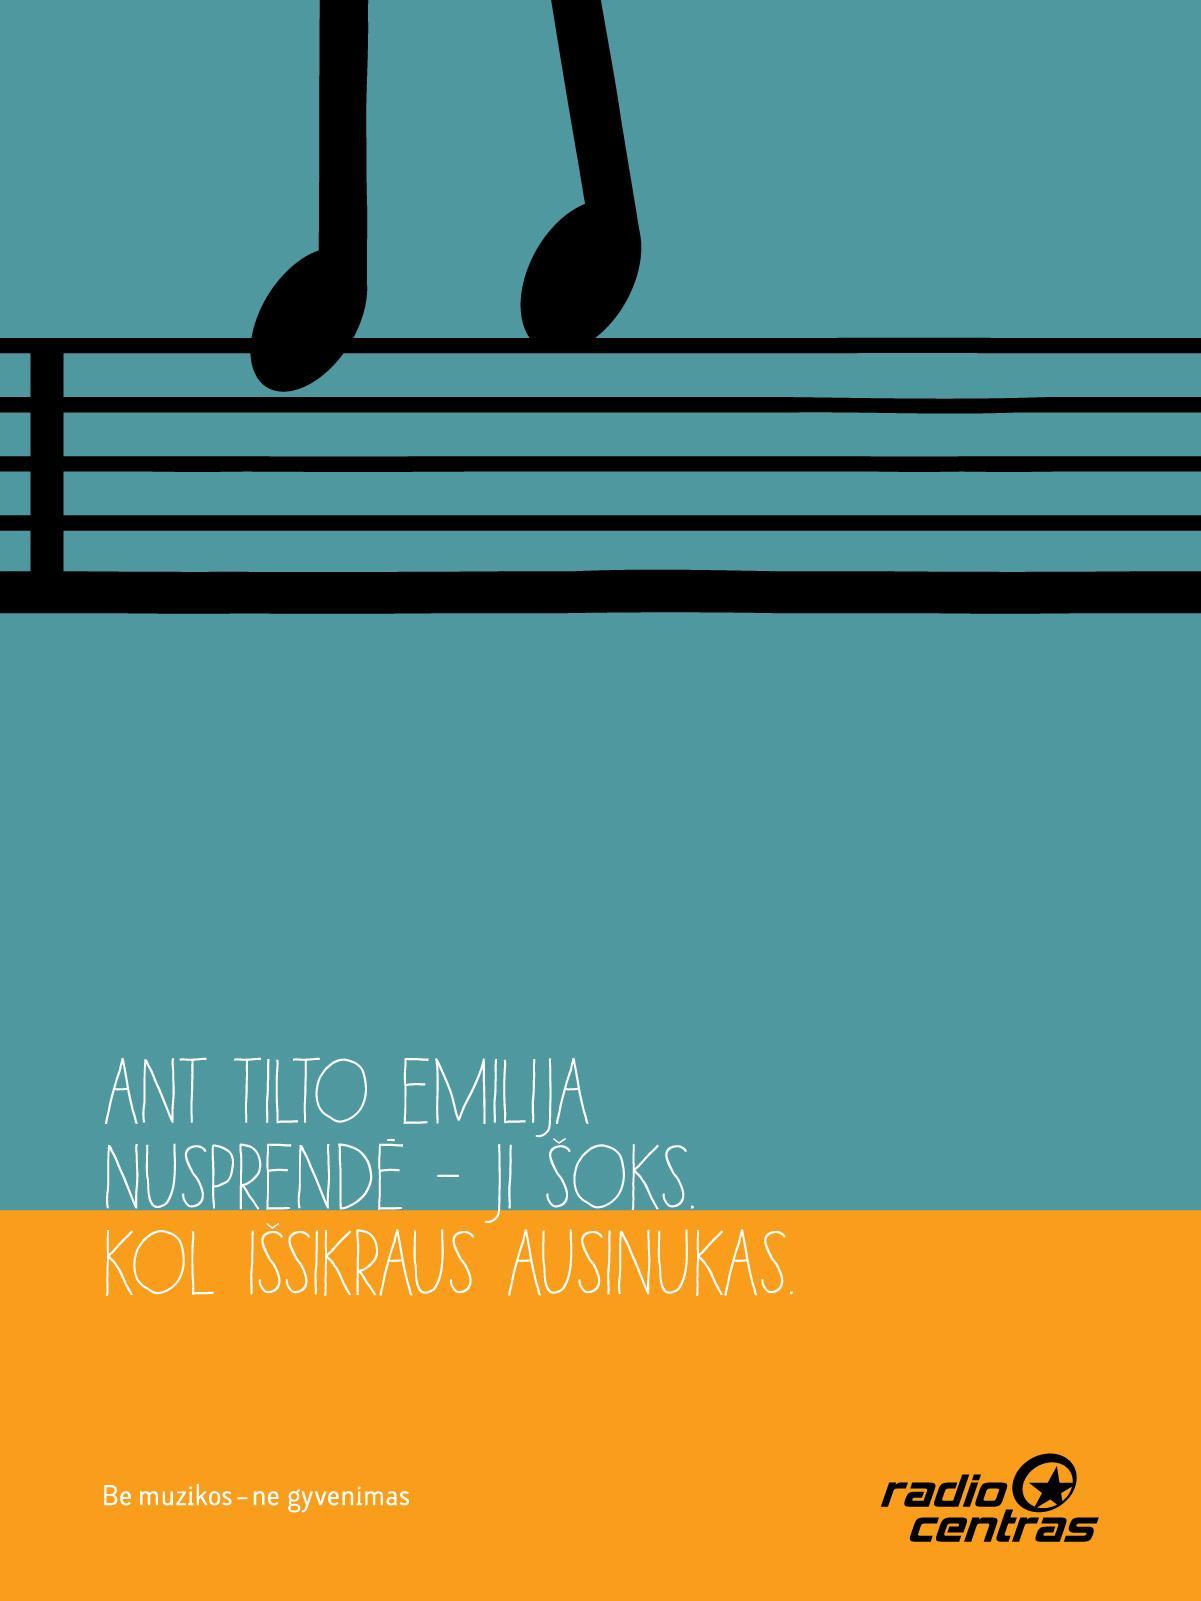 RadioCentras Print Ad -  Emilija